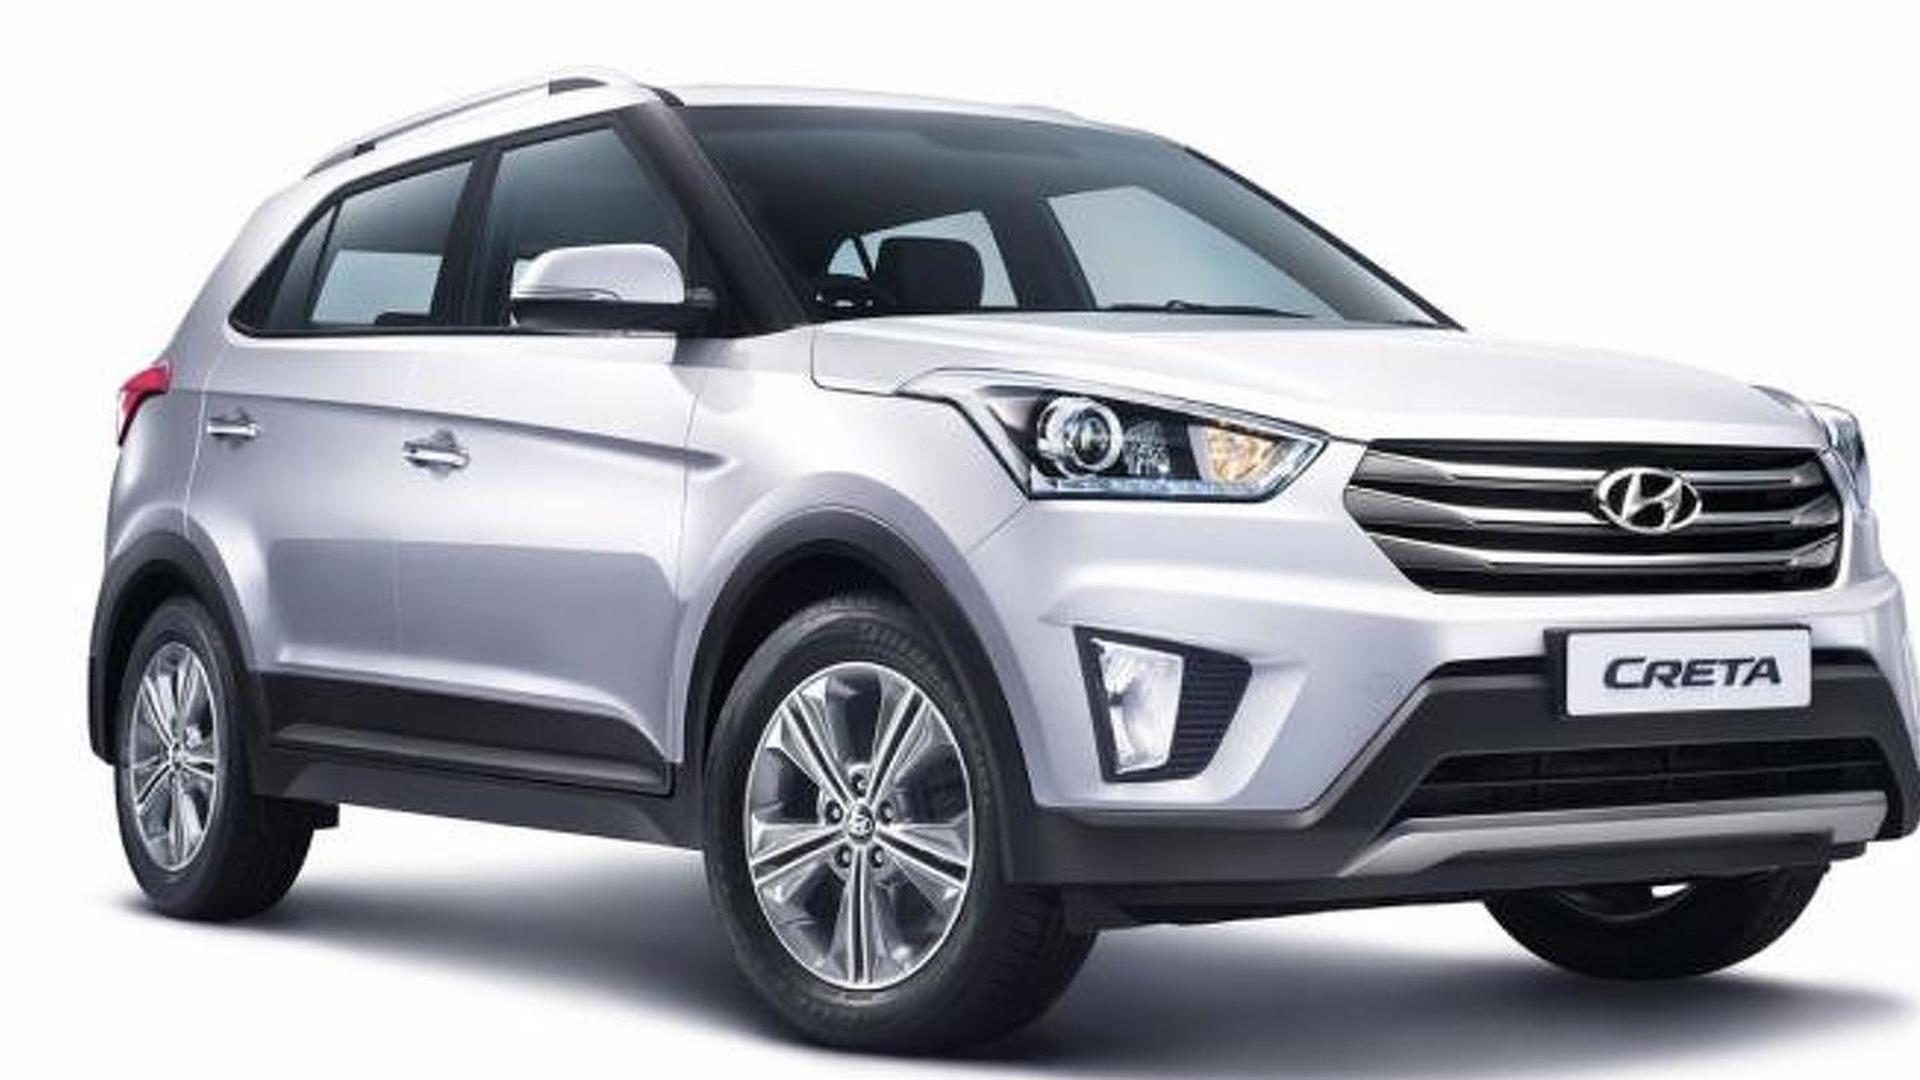 Hyundai Creta Goes Official